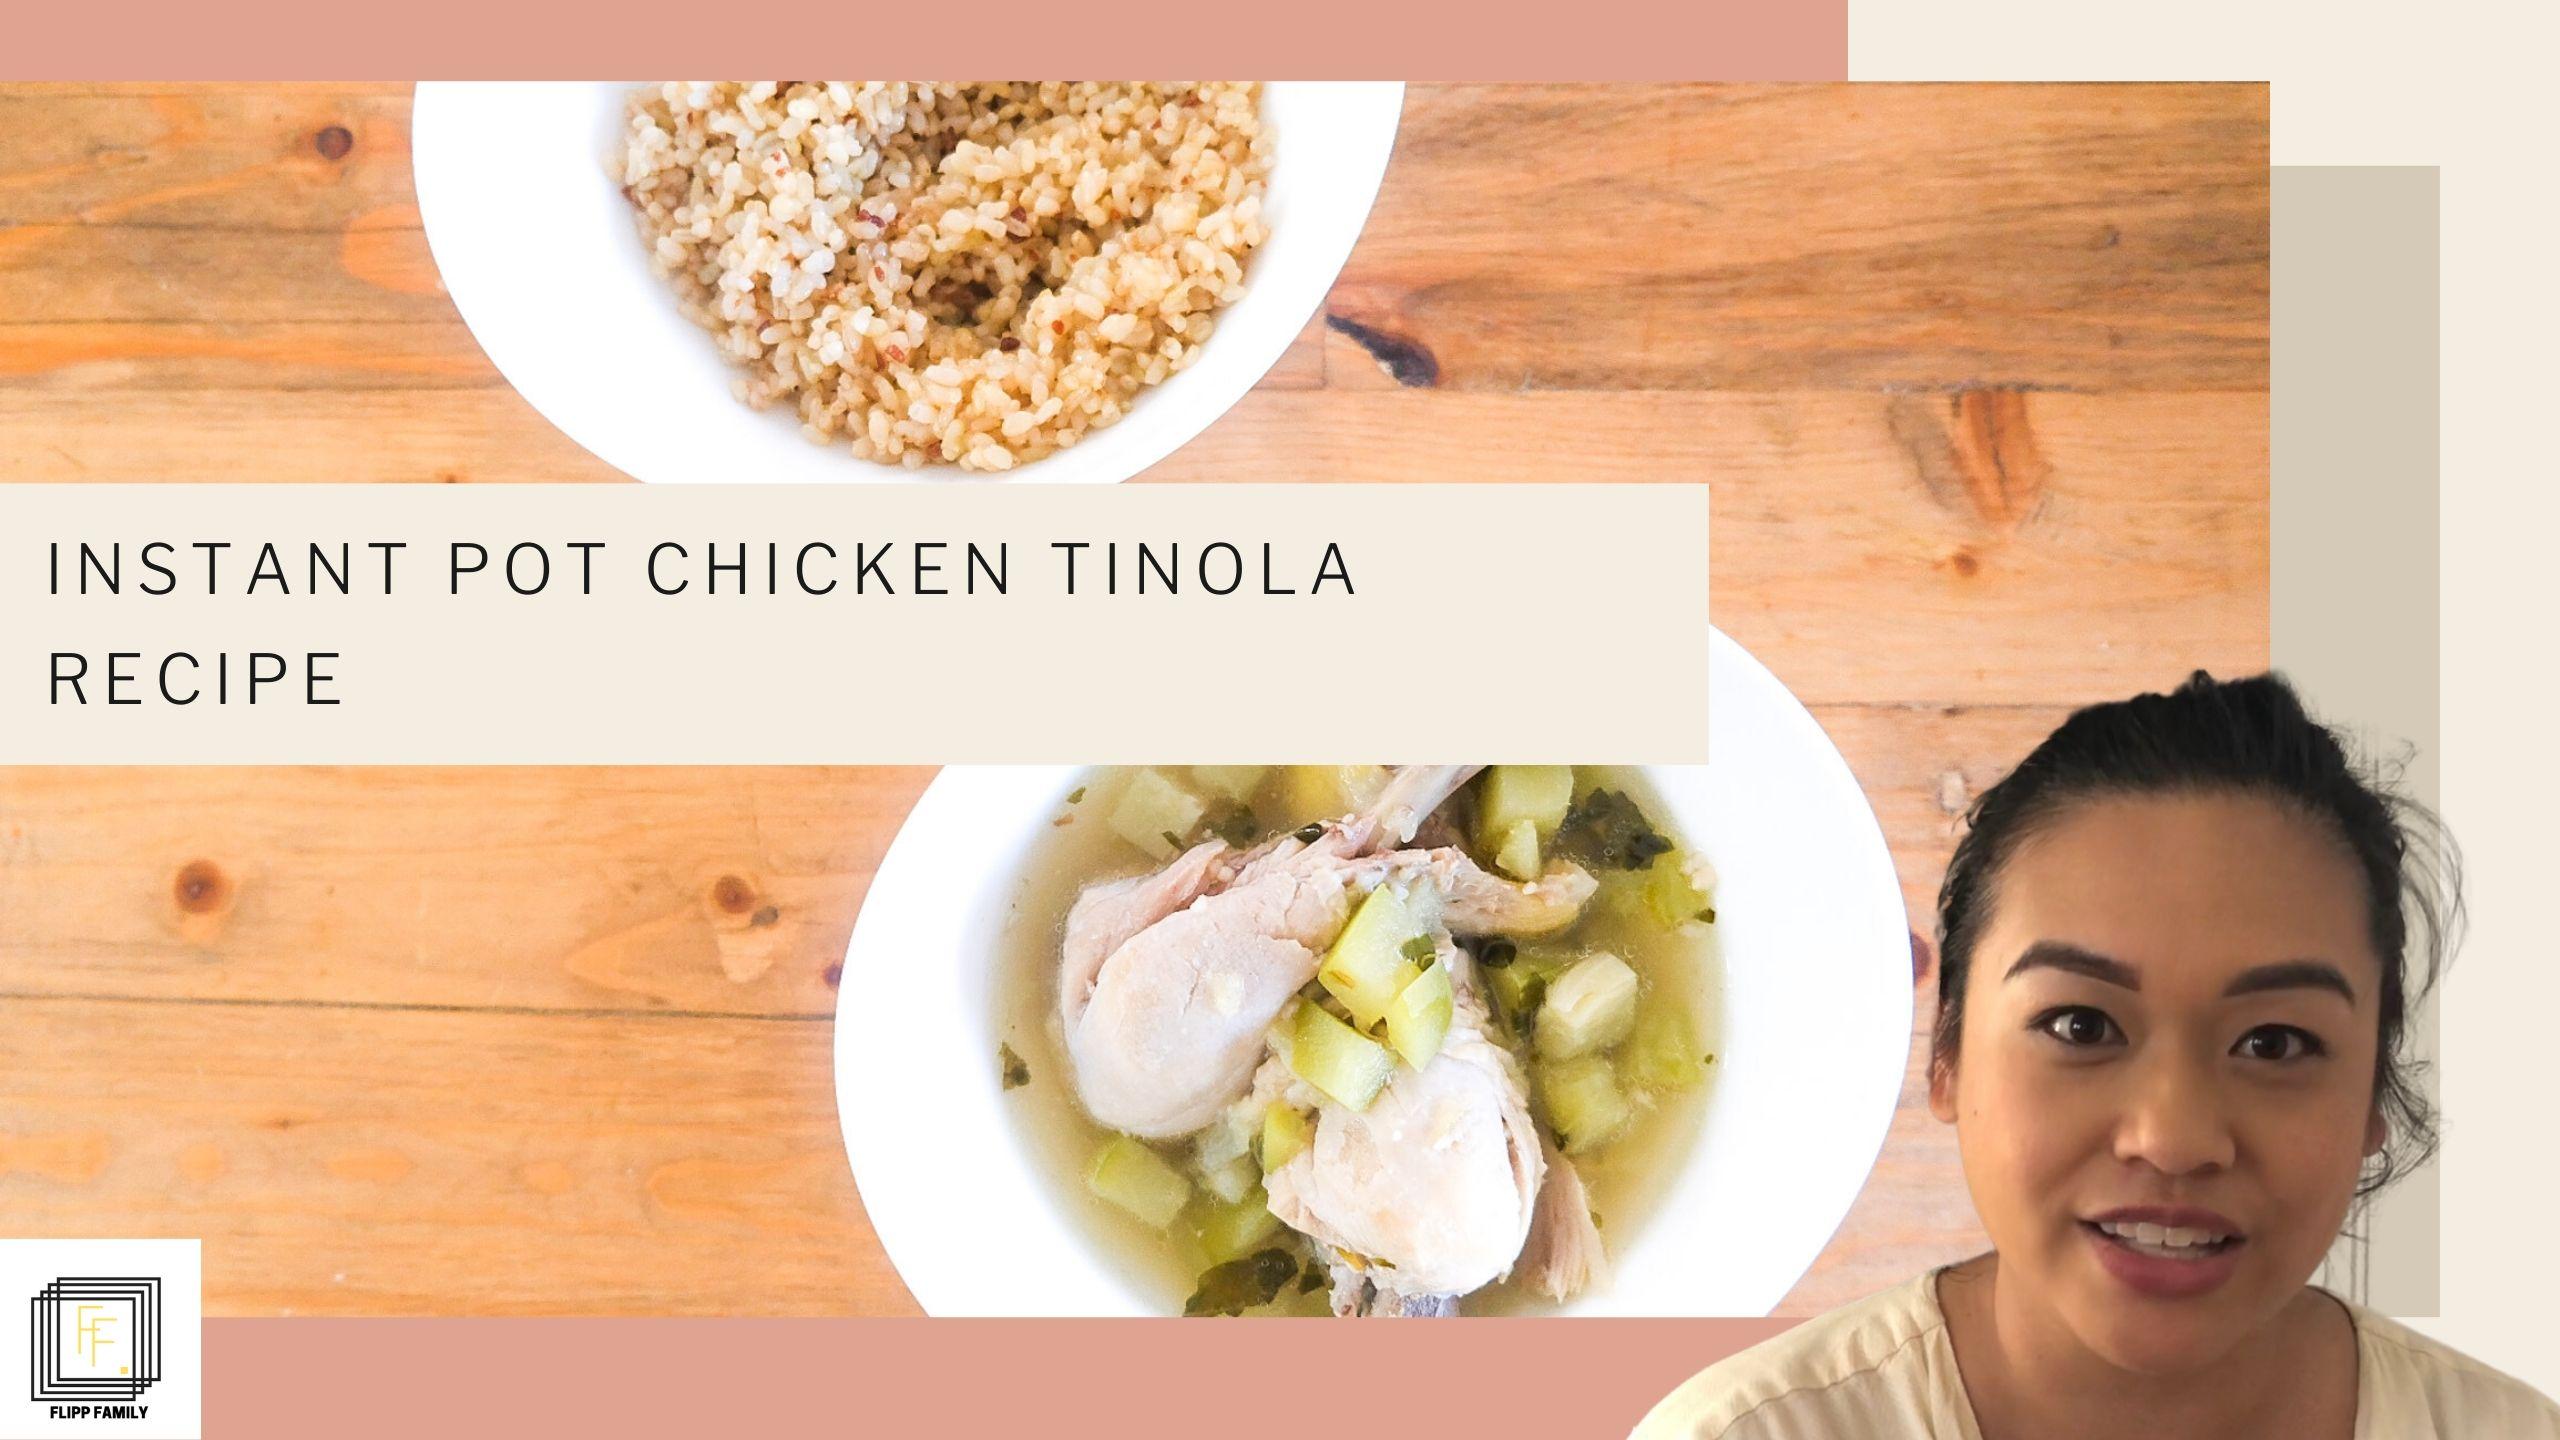 Instant Pot Chicken Tinola Recipe